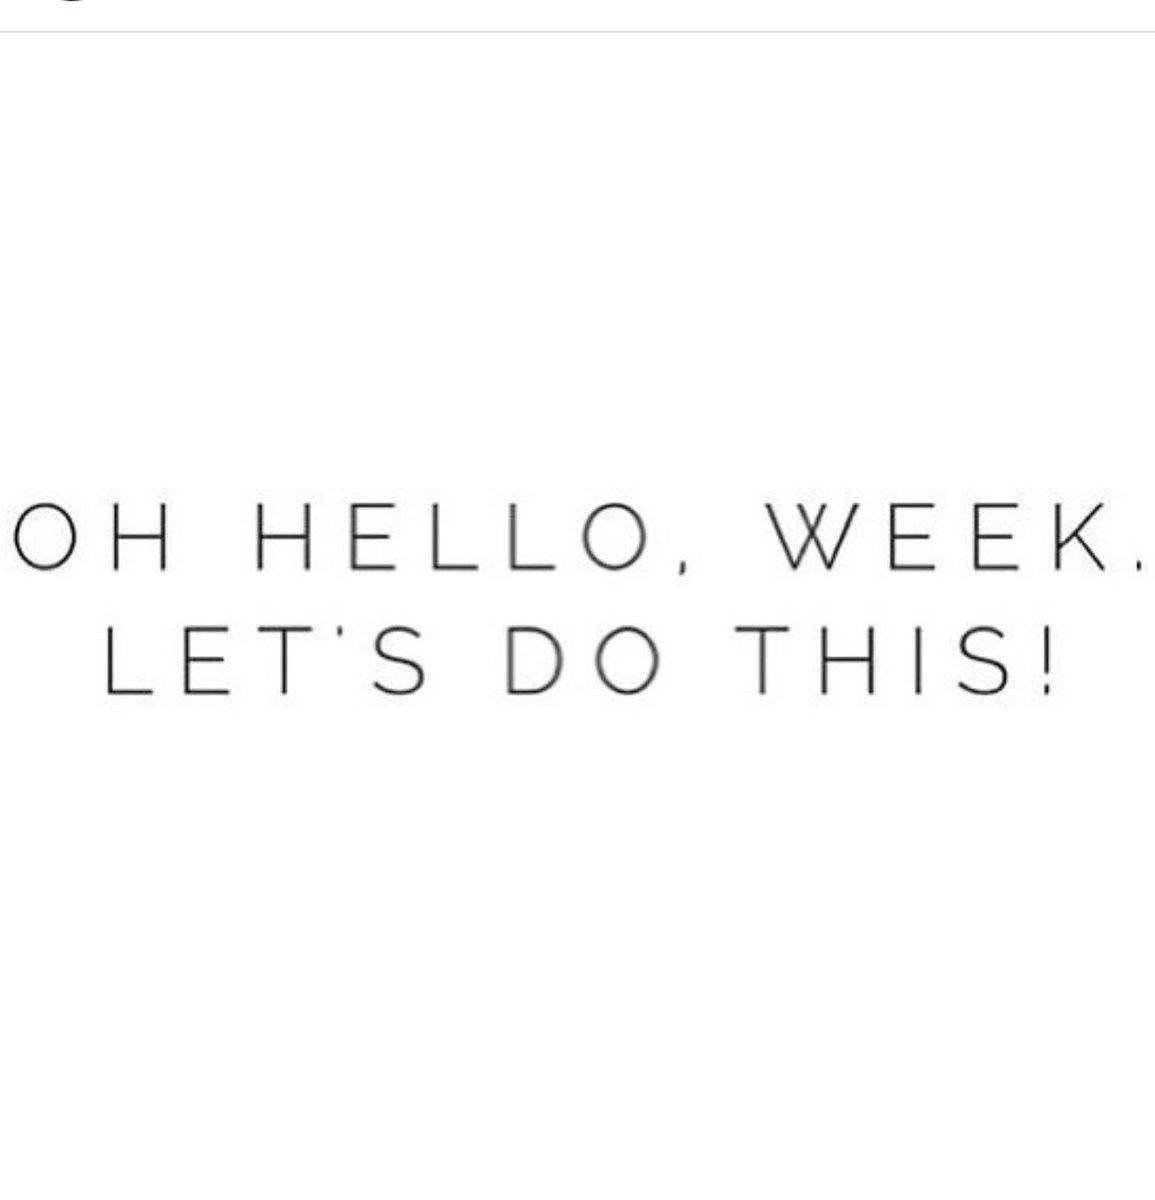 Good morning, busy week ahead !!! #MondayMorning #wegotthis #work 🙋🏼 h...